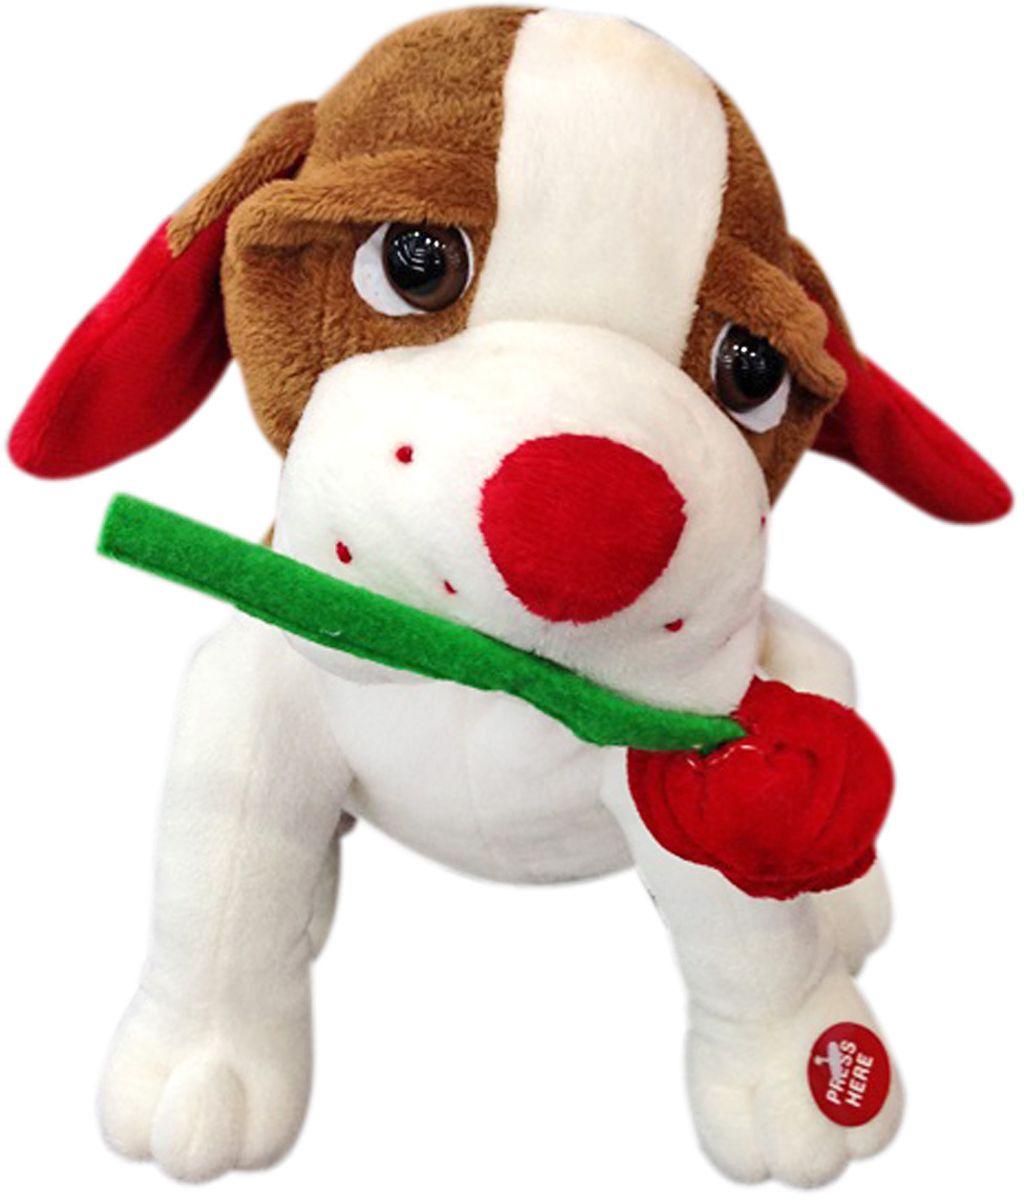 Lapa House Мягкая игрушка Собачка 25 см - Мягкие игрушки